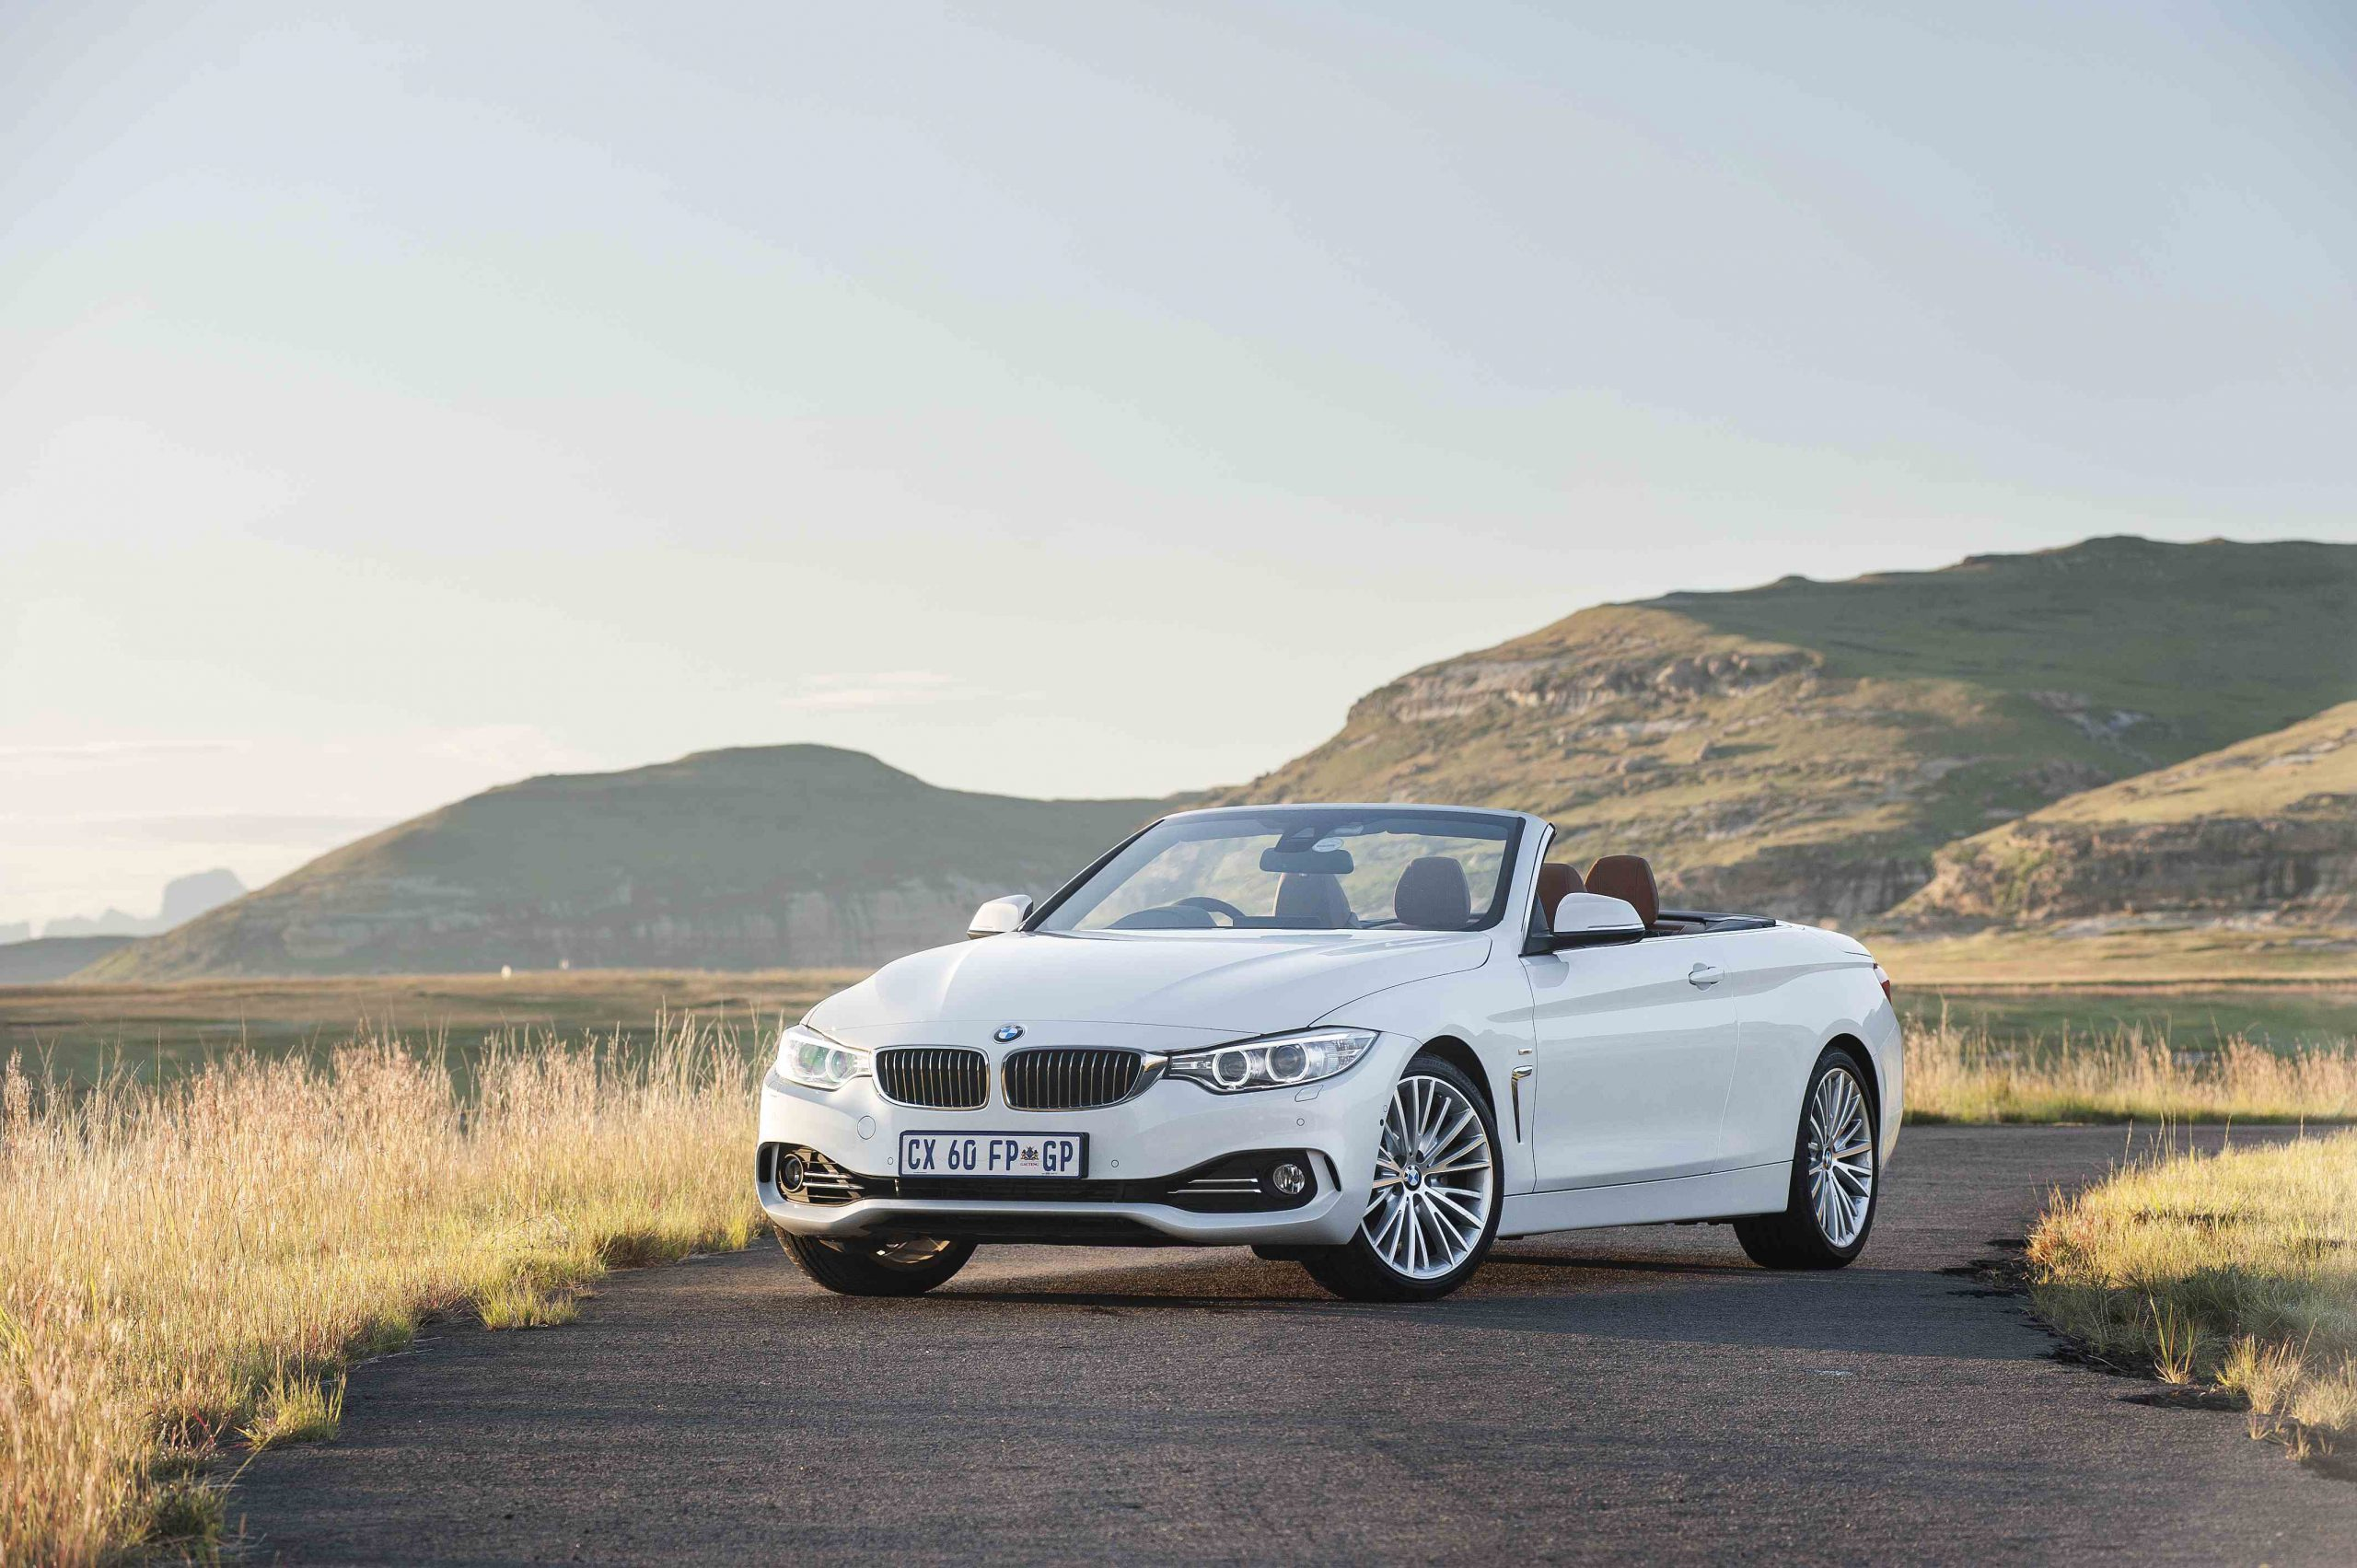 Topless BMW 4-Series Lands: Latest News